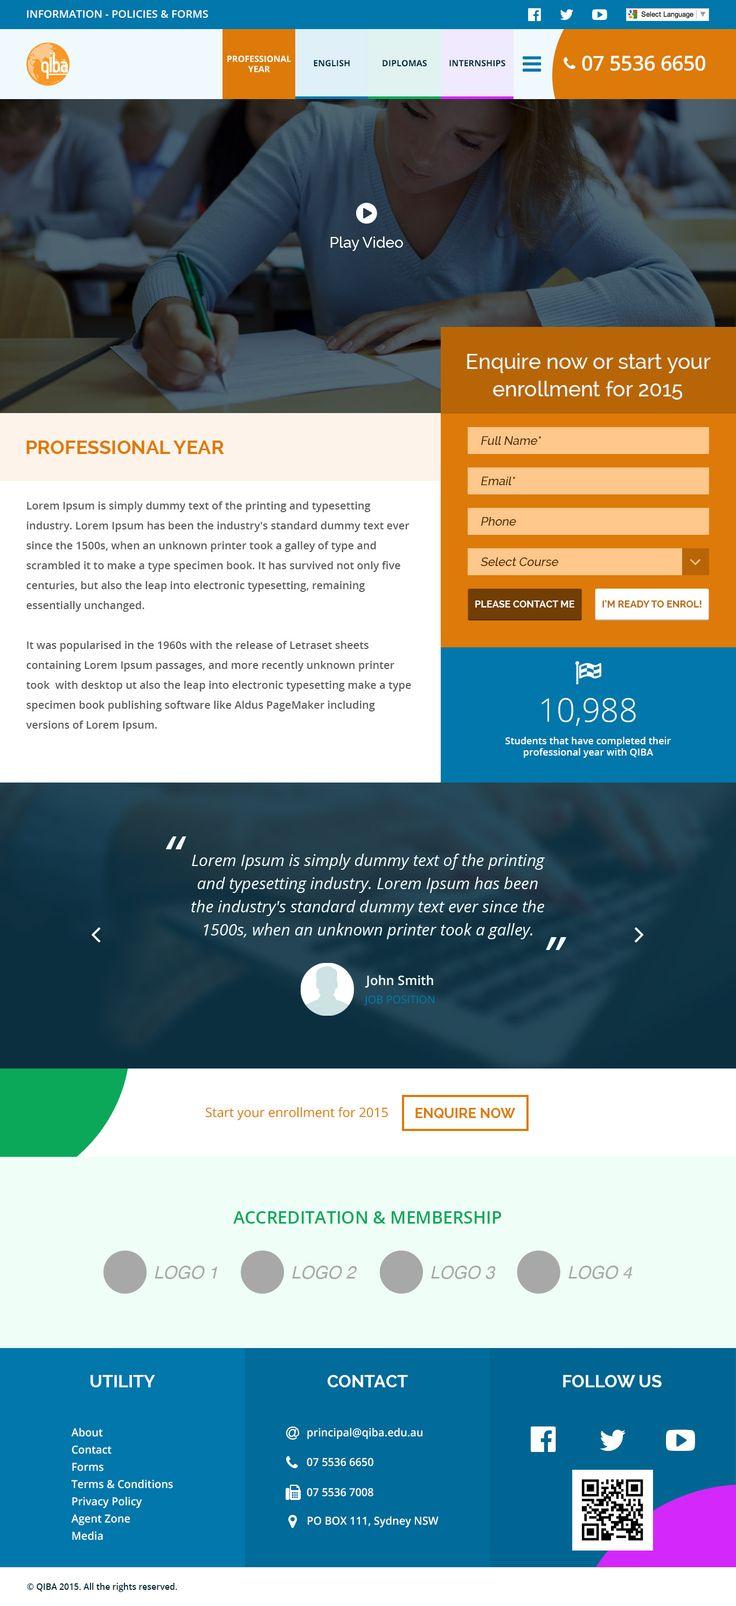 Website design for Queensland International Business Academy